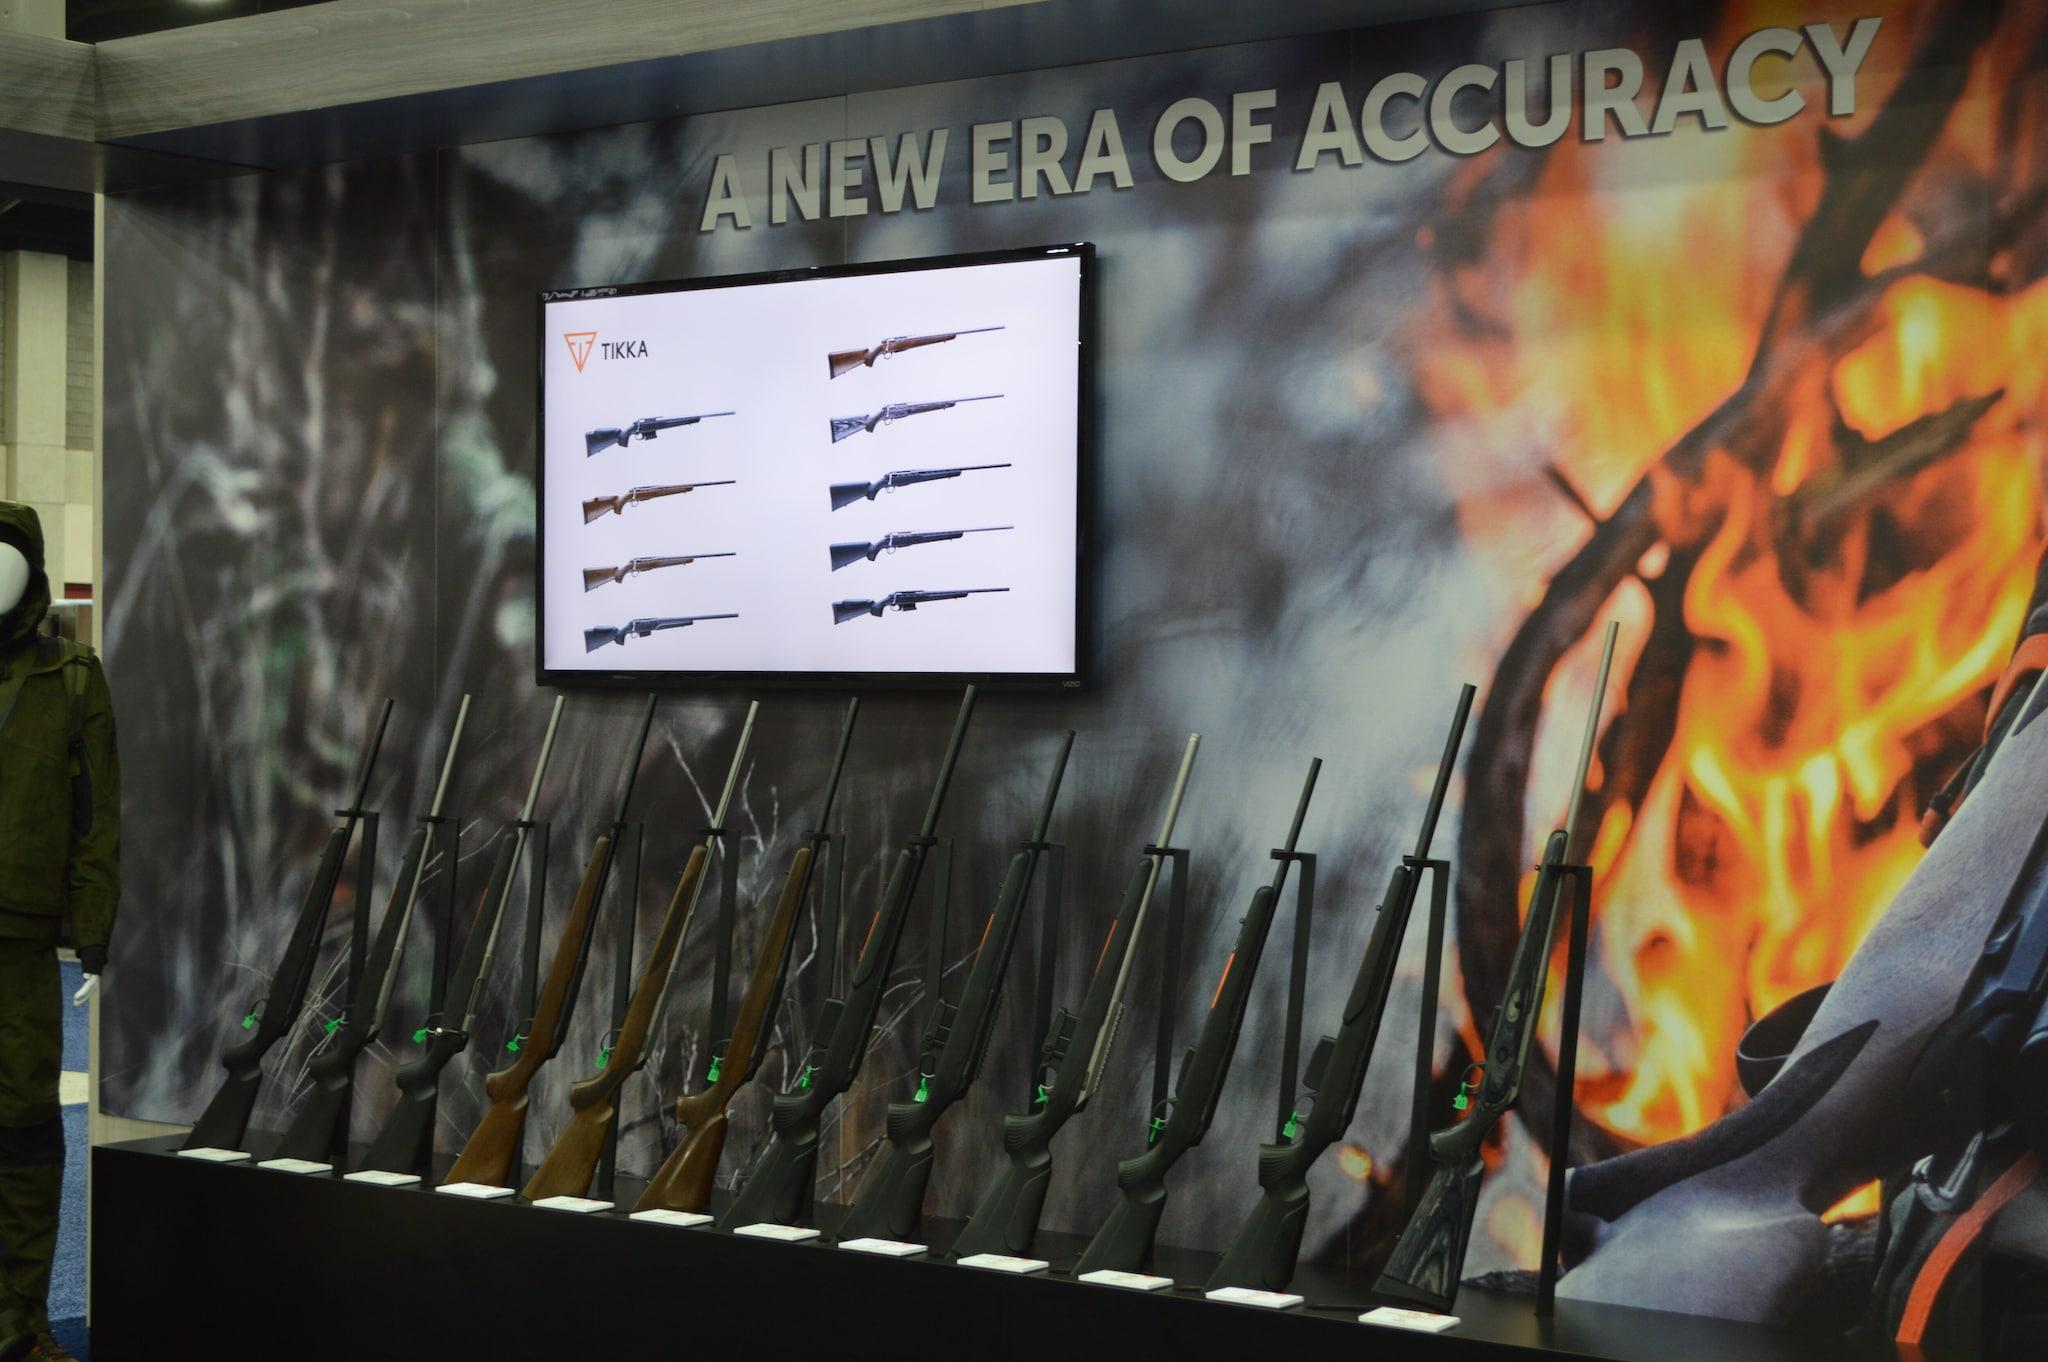 The full lineup of Tikka's new T3x rifles. (Photo: Kristin Alberts/Guns.com)